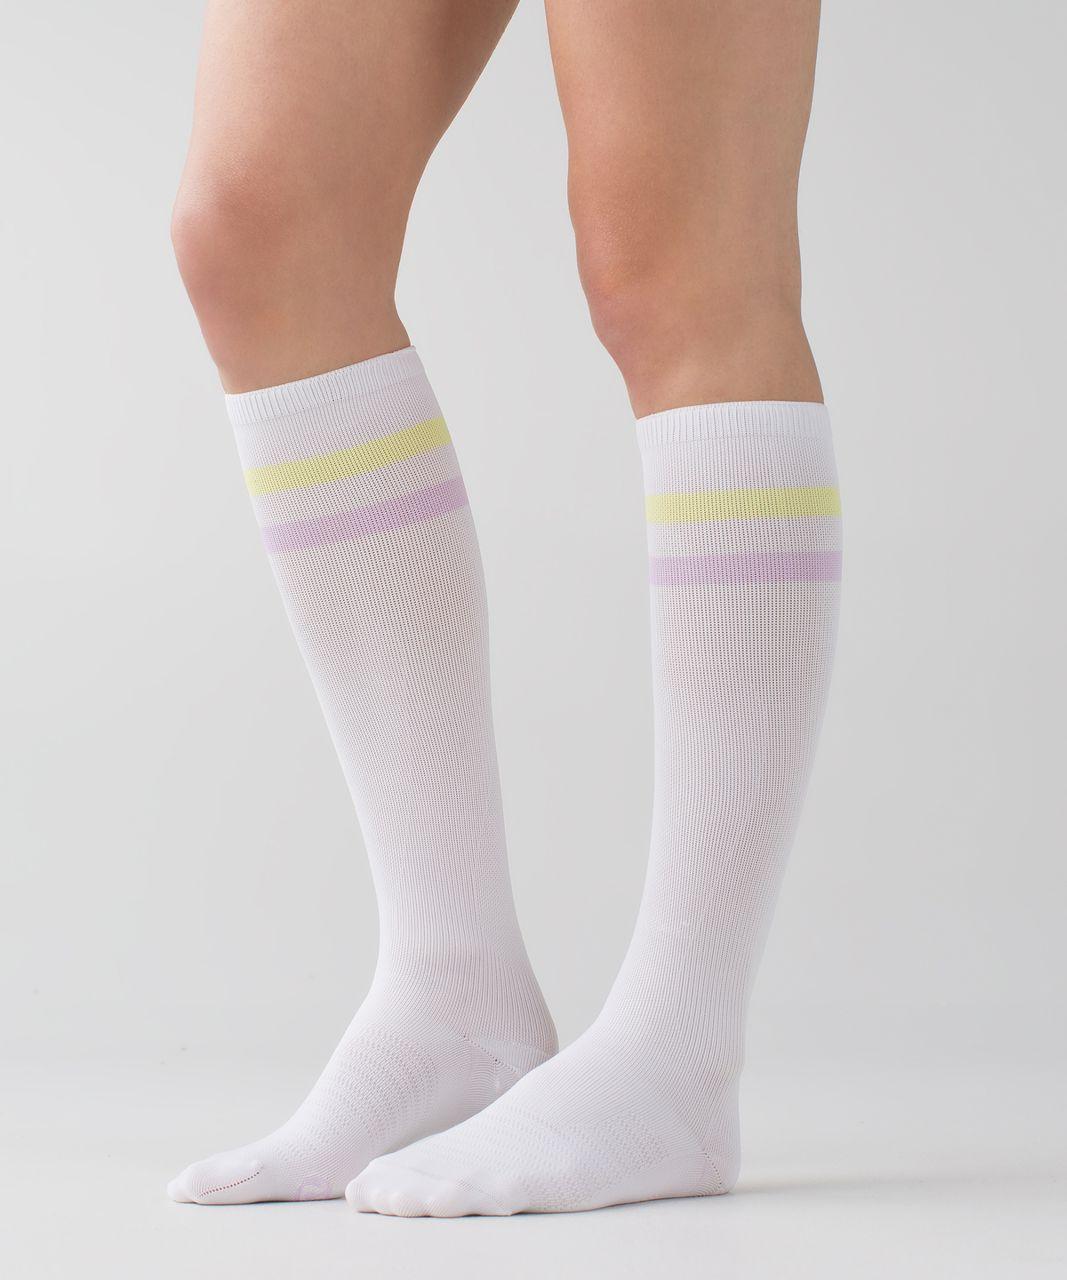 Lululemon Women's Keep It Tight Sock - Varsity Stripe White Clarity Yellow Pretty Purple